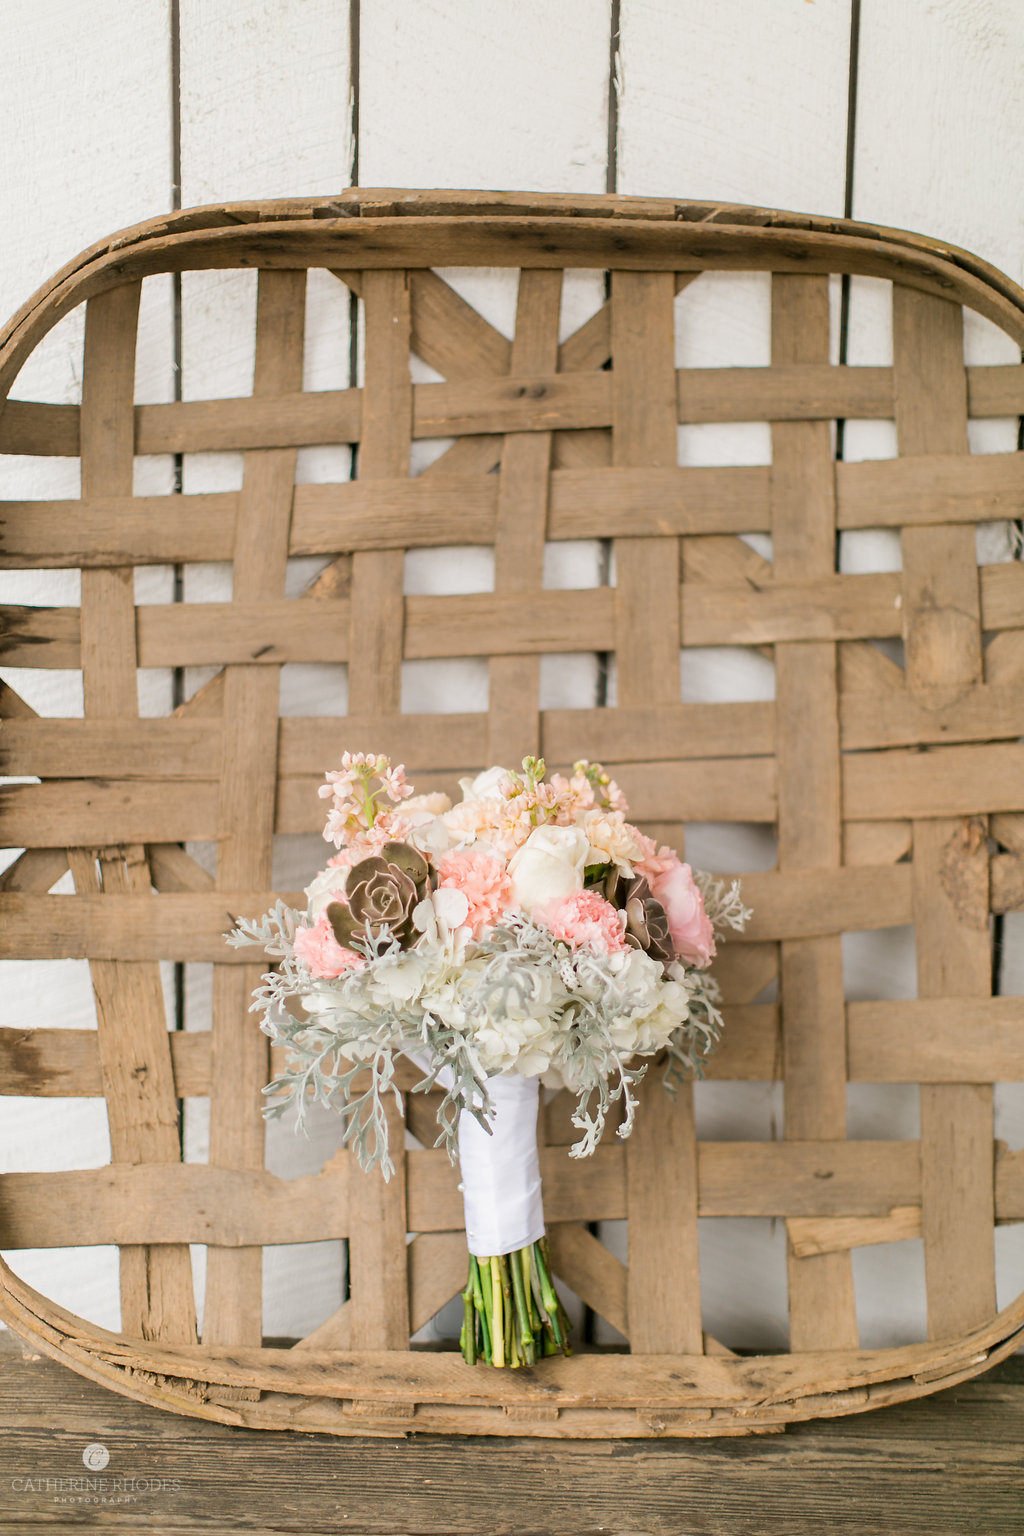 BlueBellFarm_WeddingPhotography_ColumbiaMissouri_Highlight_CatherineRhodesPhotography-6.jpg